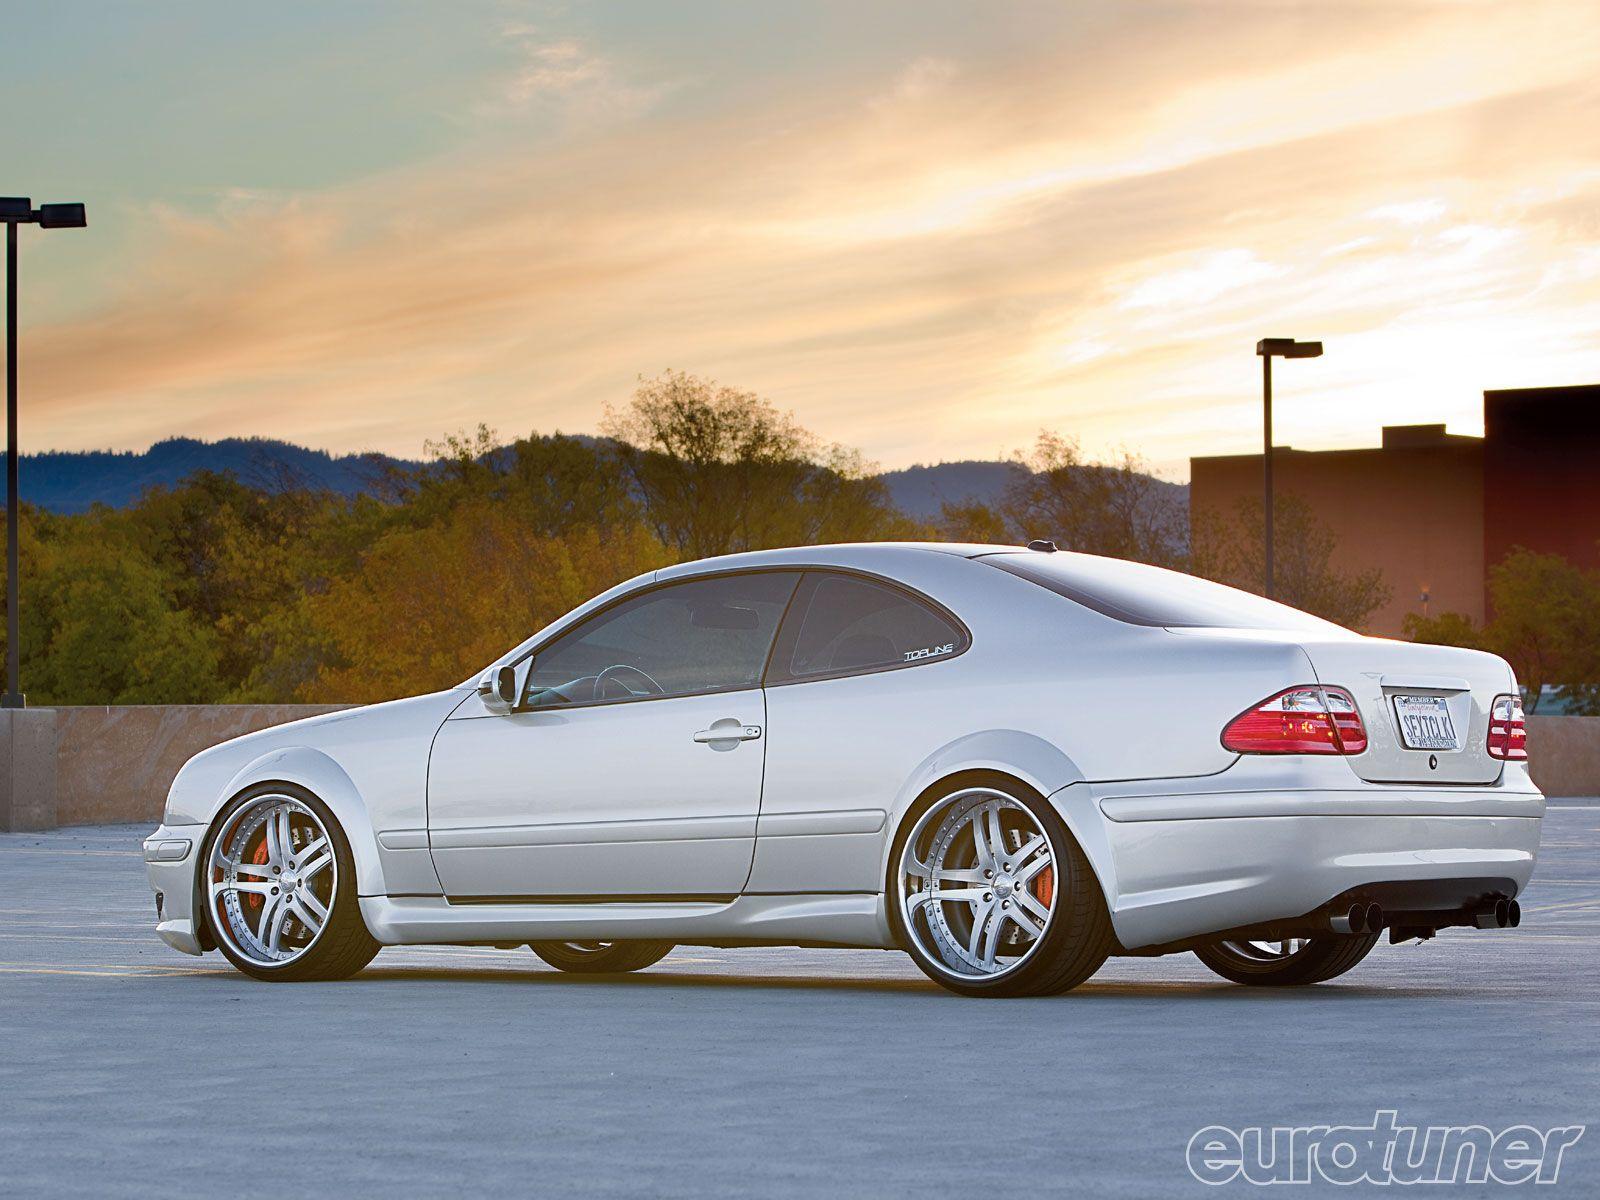 Mercedes benz clk 55 amg coupe